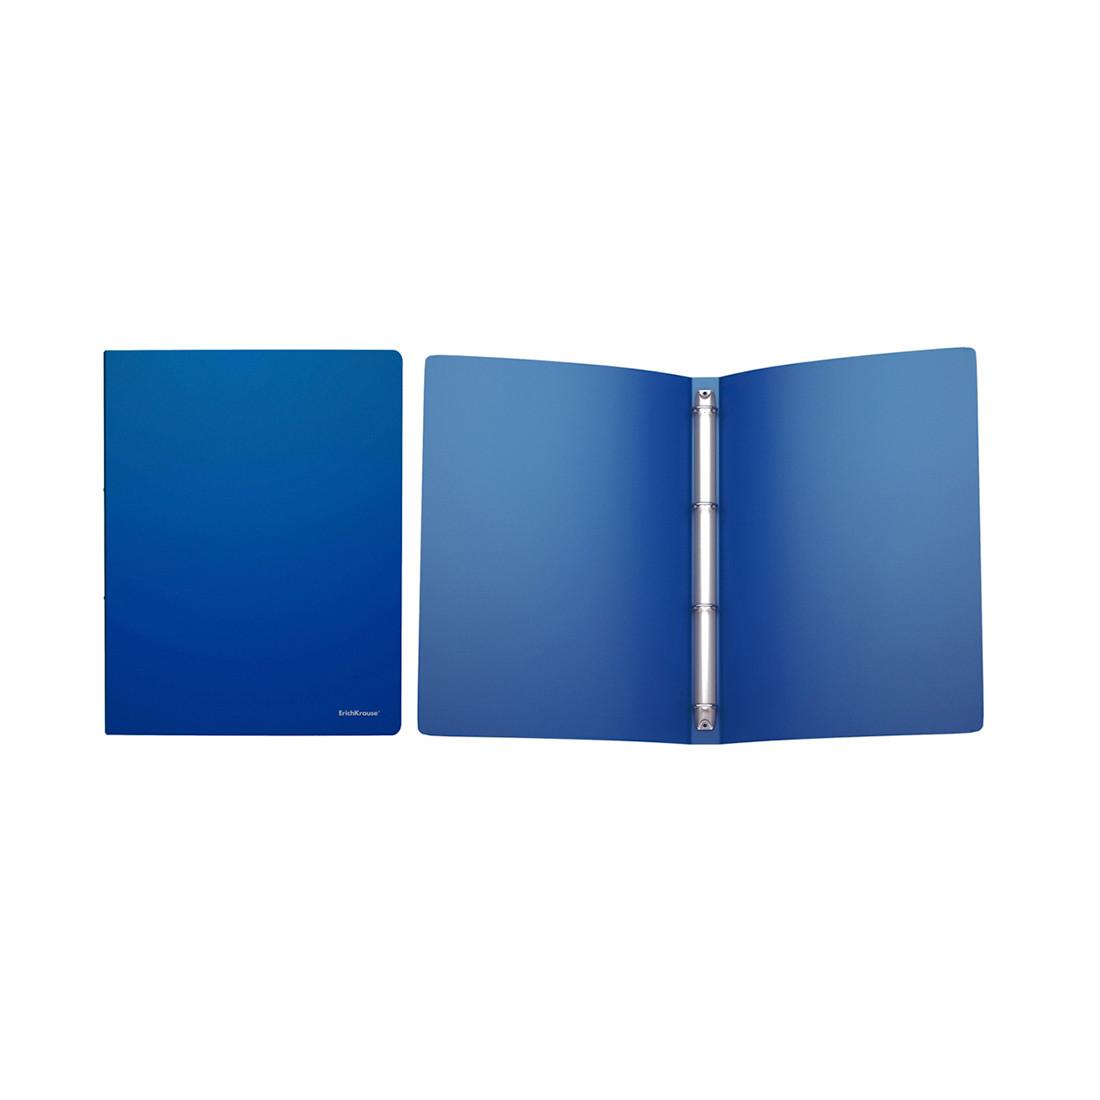 Папка на 4 кольцах пластик. ErichKrause® Classic, 24мм, A4, синий (в коробке-дисплее по 12 шт.)